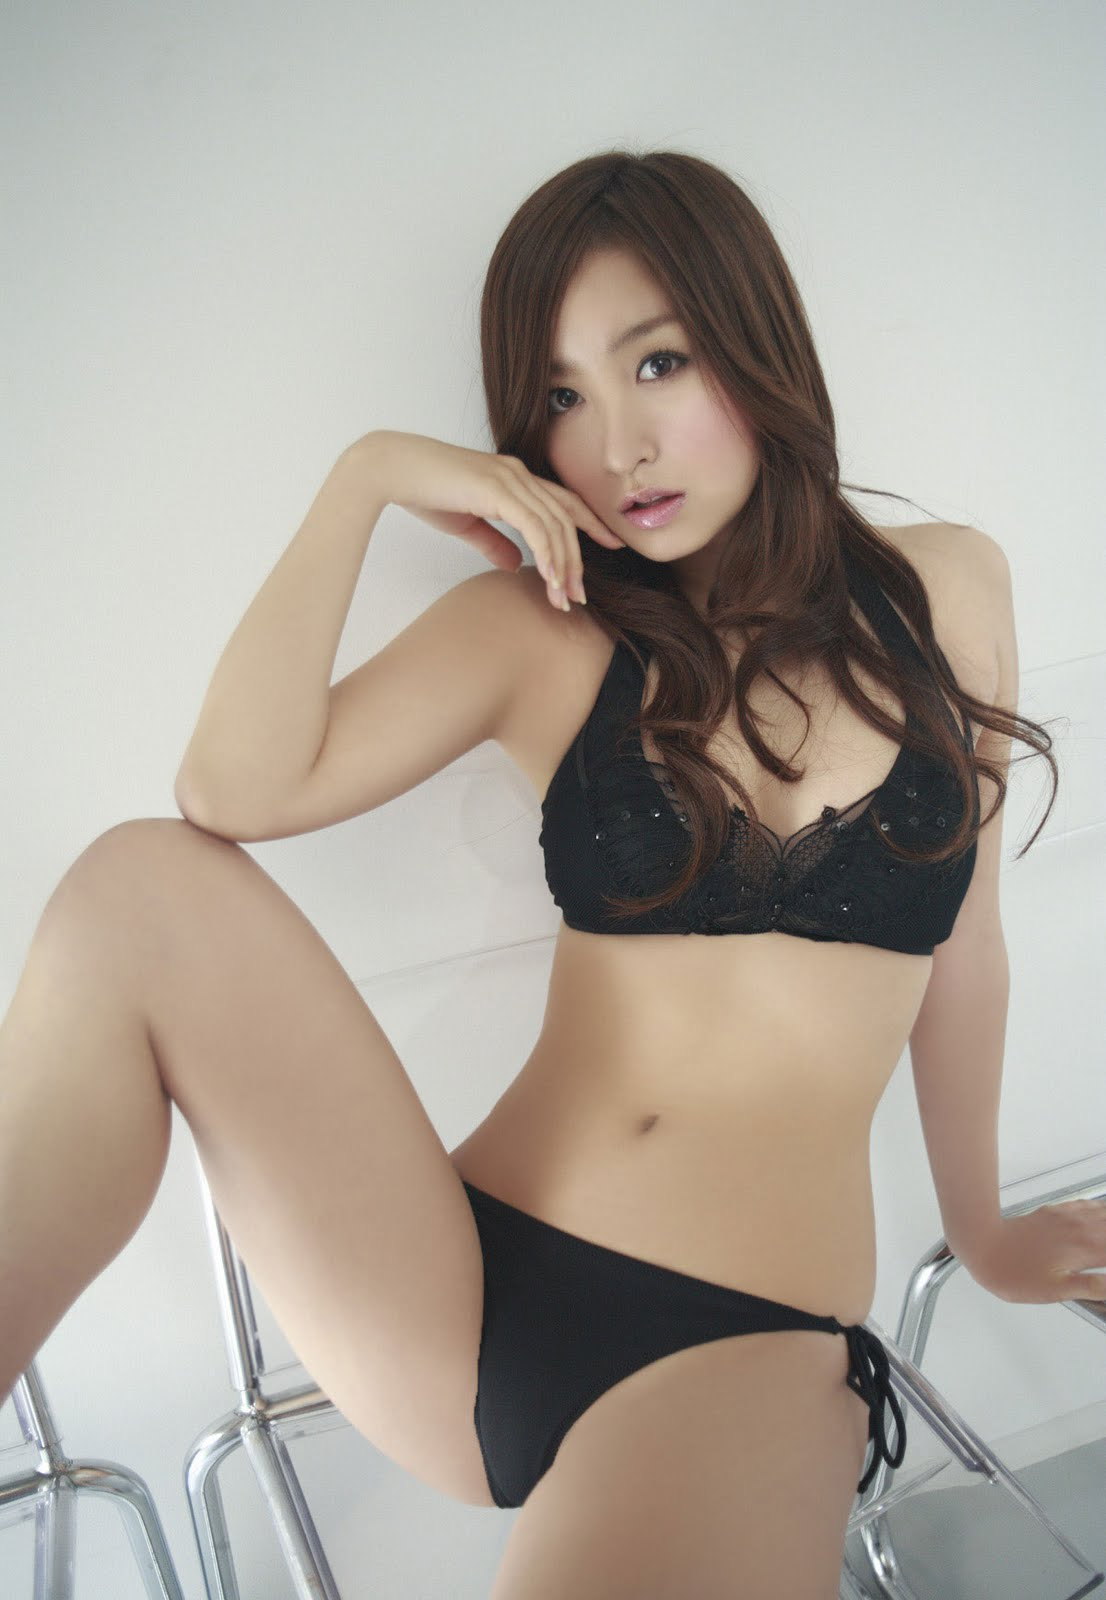 http://3.bp.blogspot.com/_u151eCr02IU/TIXDzVxGzsI/AAAAAAAAFZM/8k6TNV6ot38/s1600/Aya-Kiguchi-Cute-Bikini-Idol2.jpg